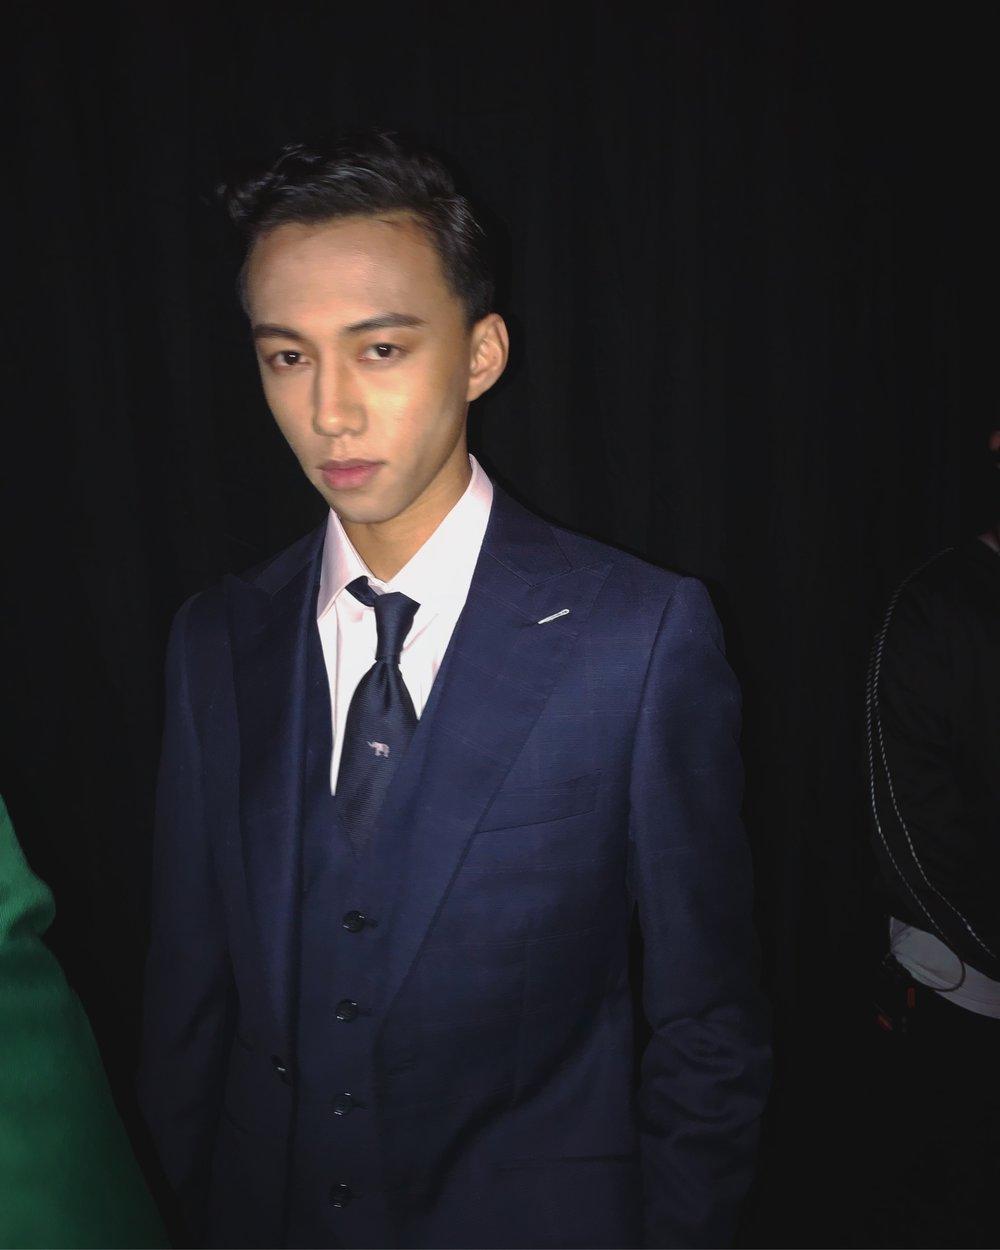 John backstage